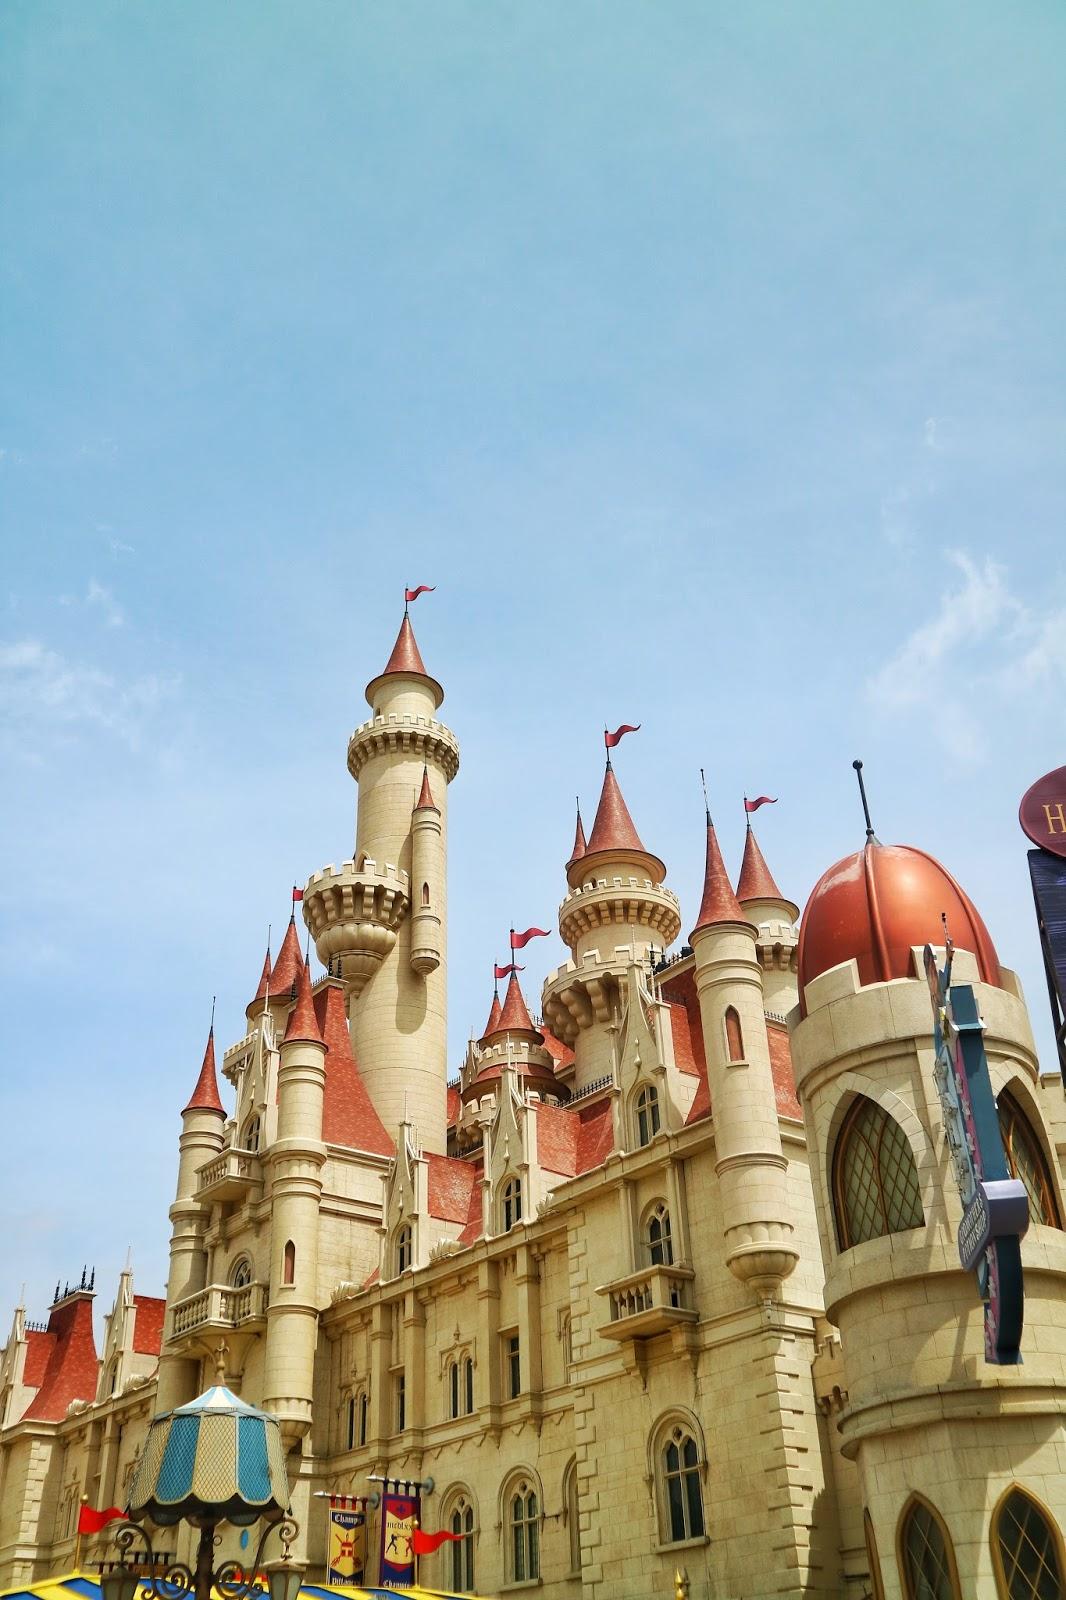 Shrek's Castle - Universal Studios Singapore